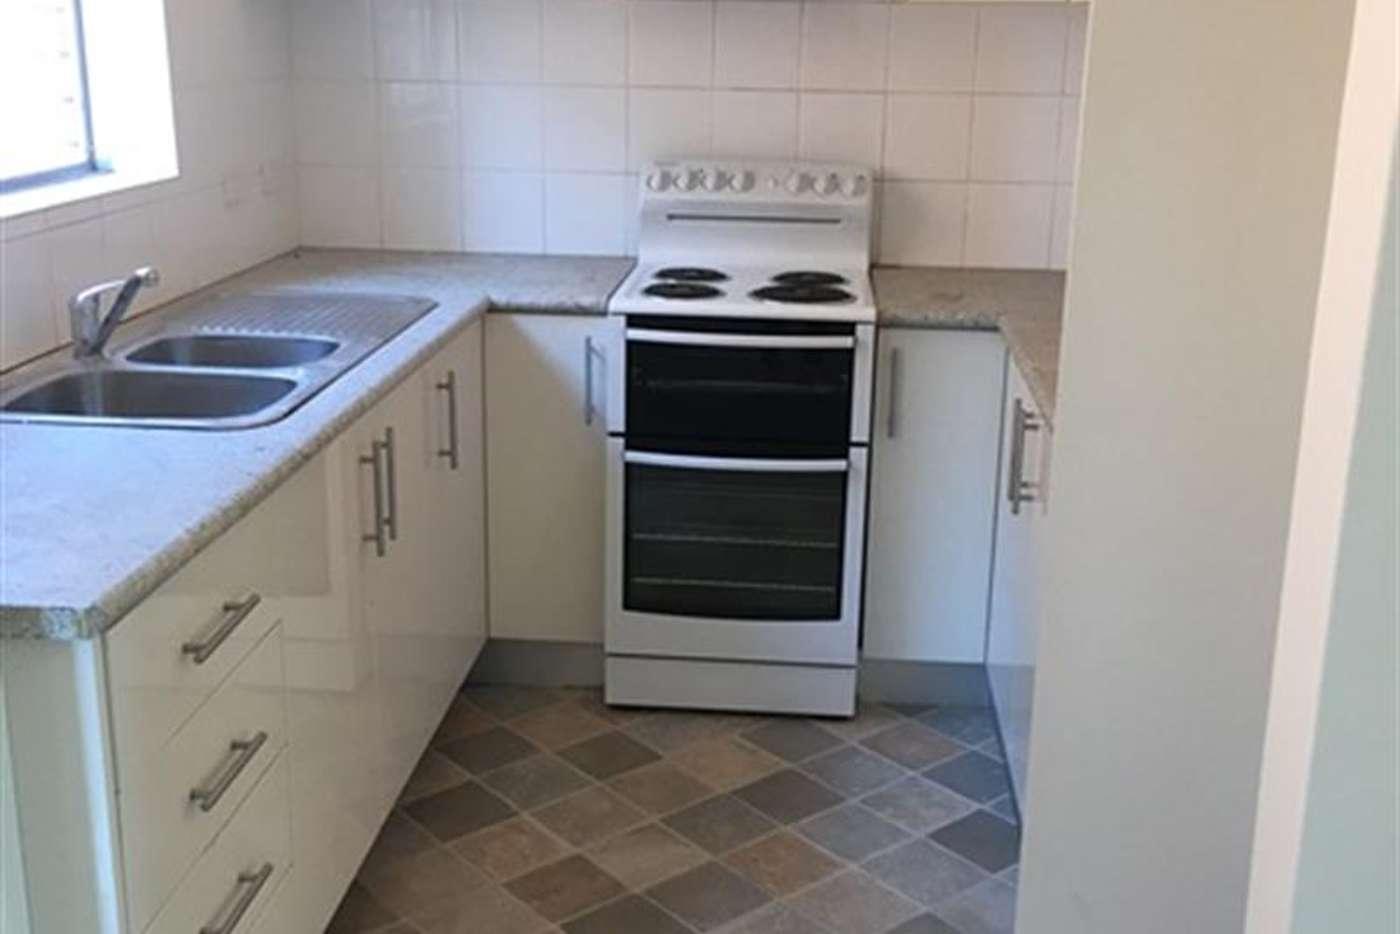 Main view of Homely apartment listing, 4/21 Blenheim  Street, Randwick NSW 2031